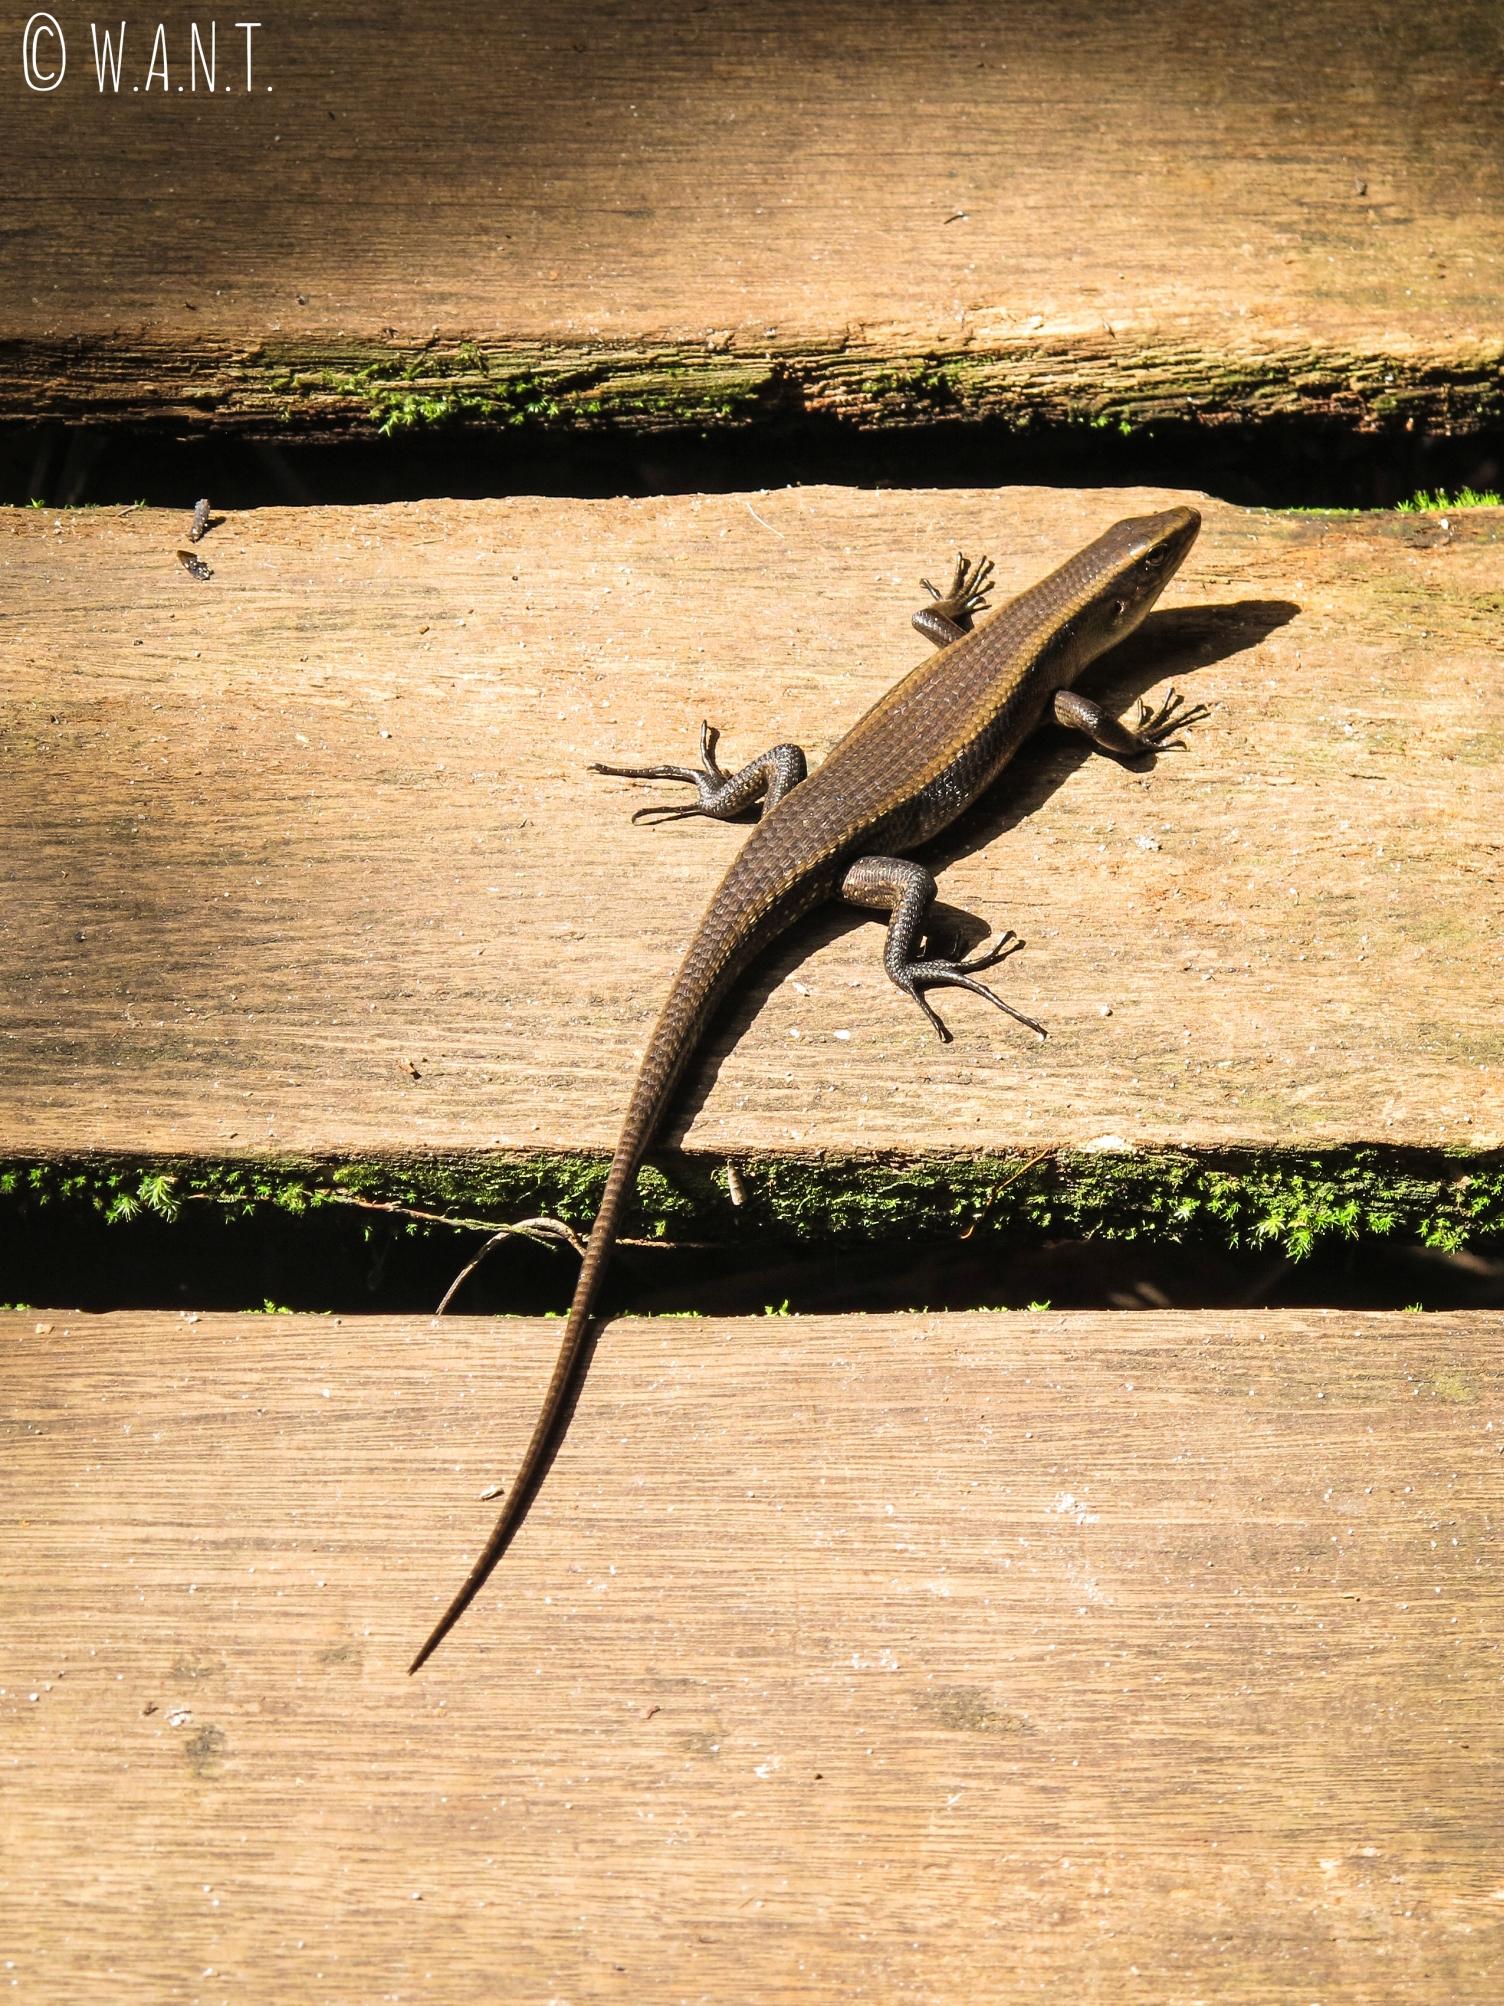 Lézard au Bako National Park